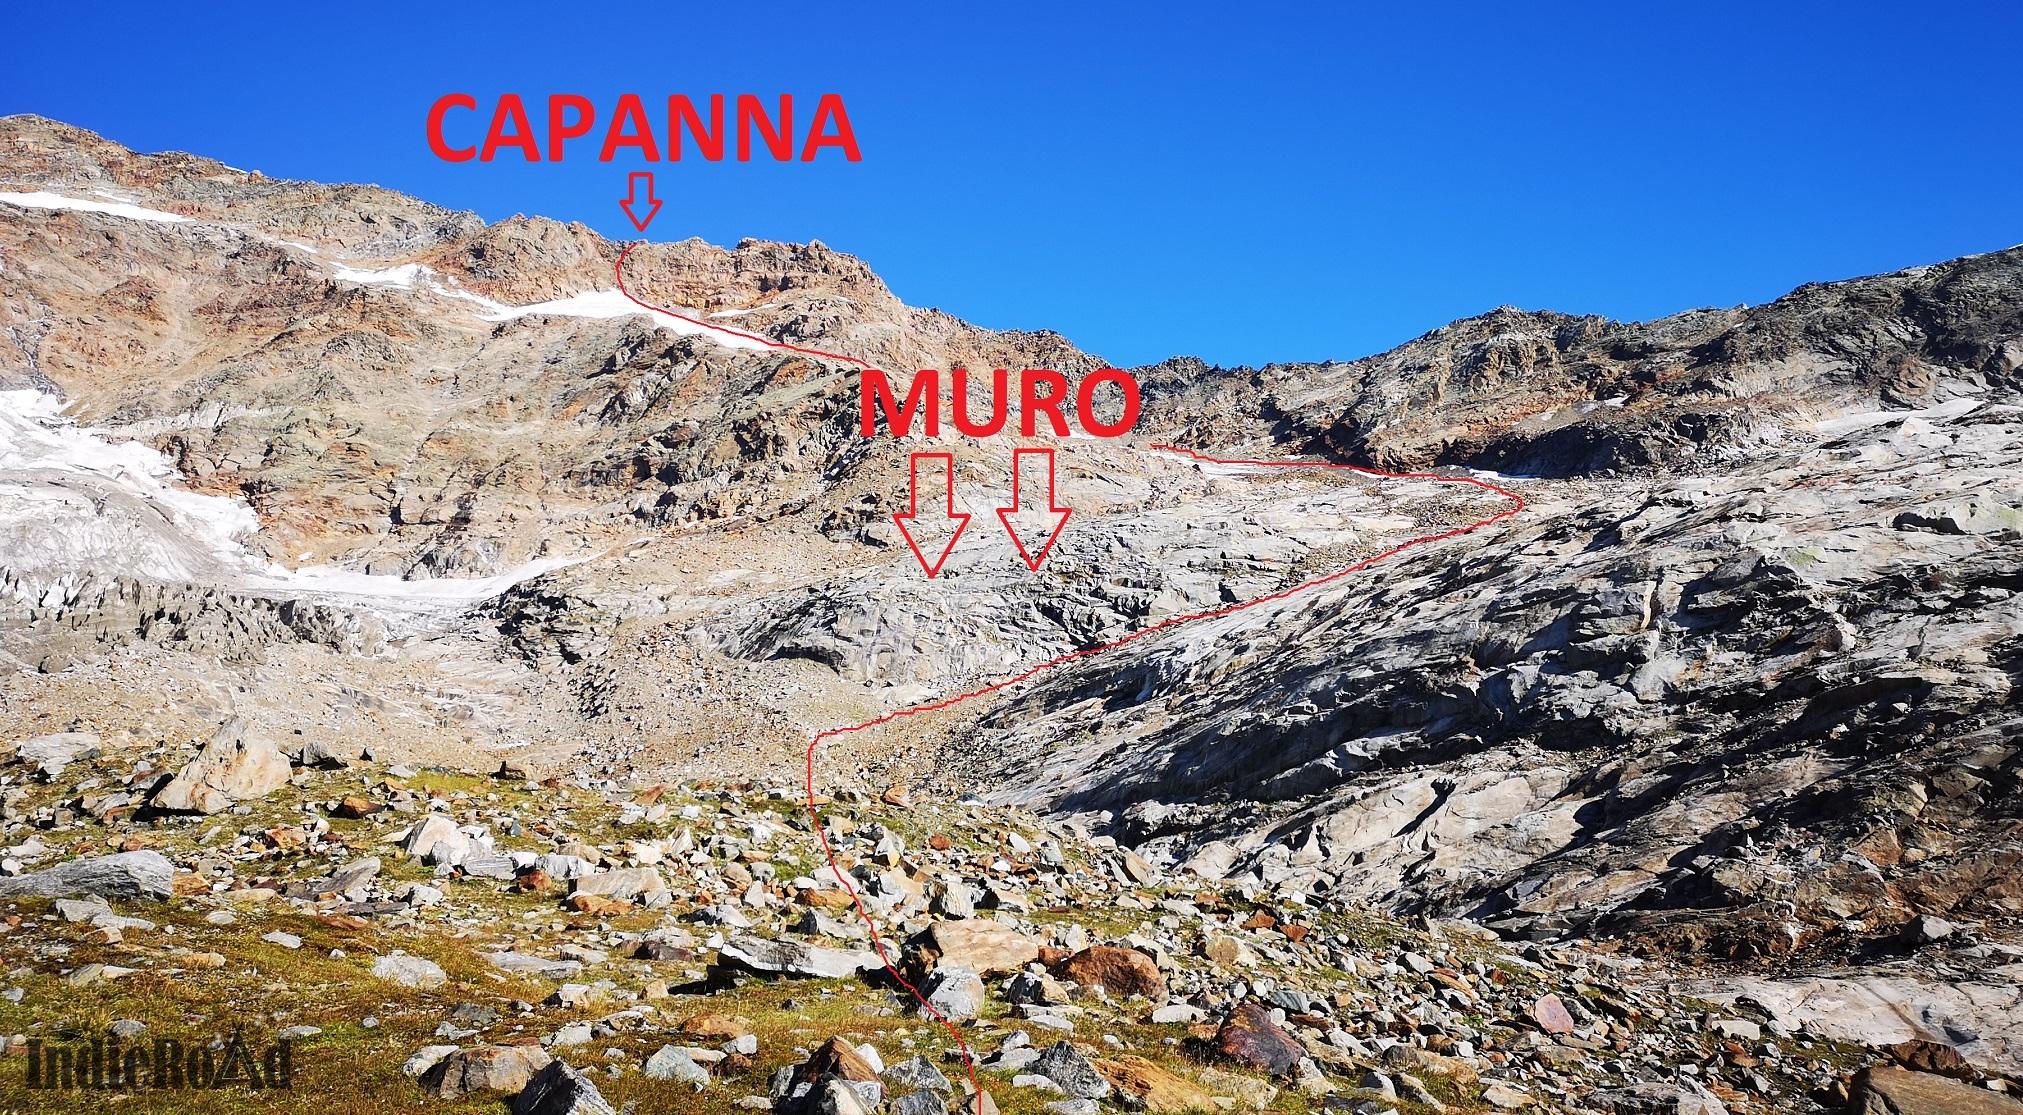 capanna resegotti monte rosa alagna valsesia bivacco gpx trekking (2)